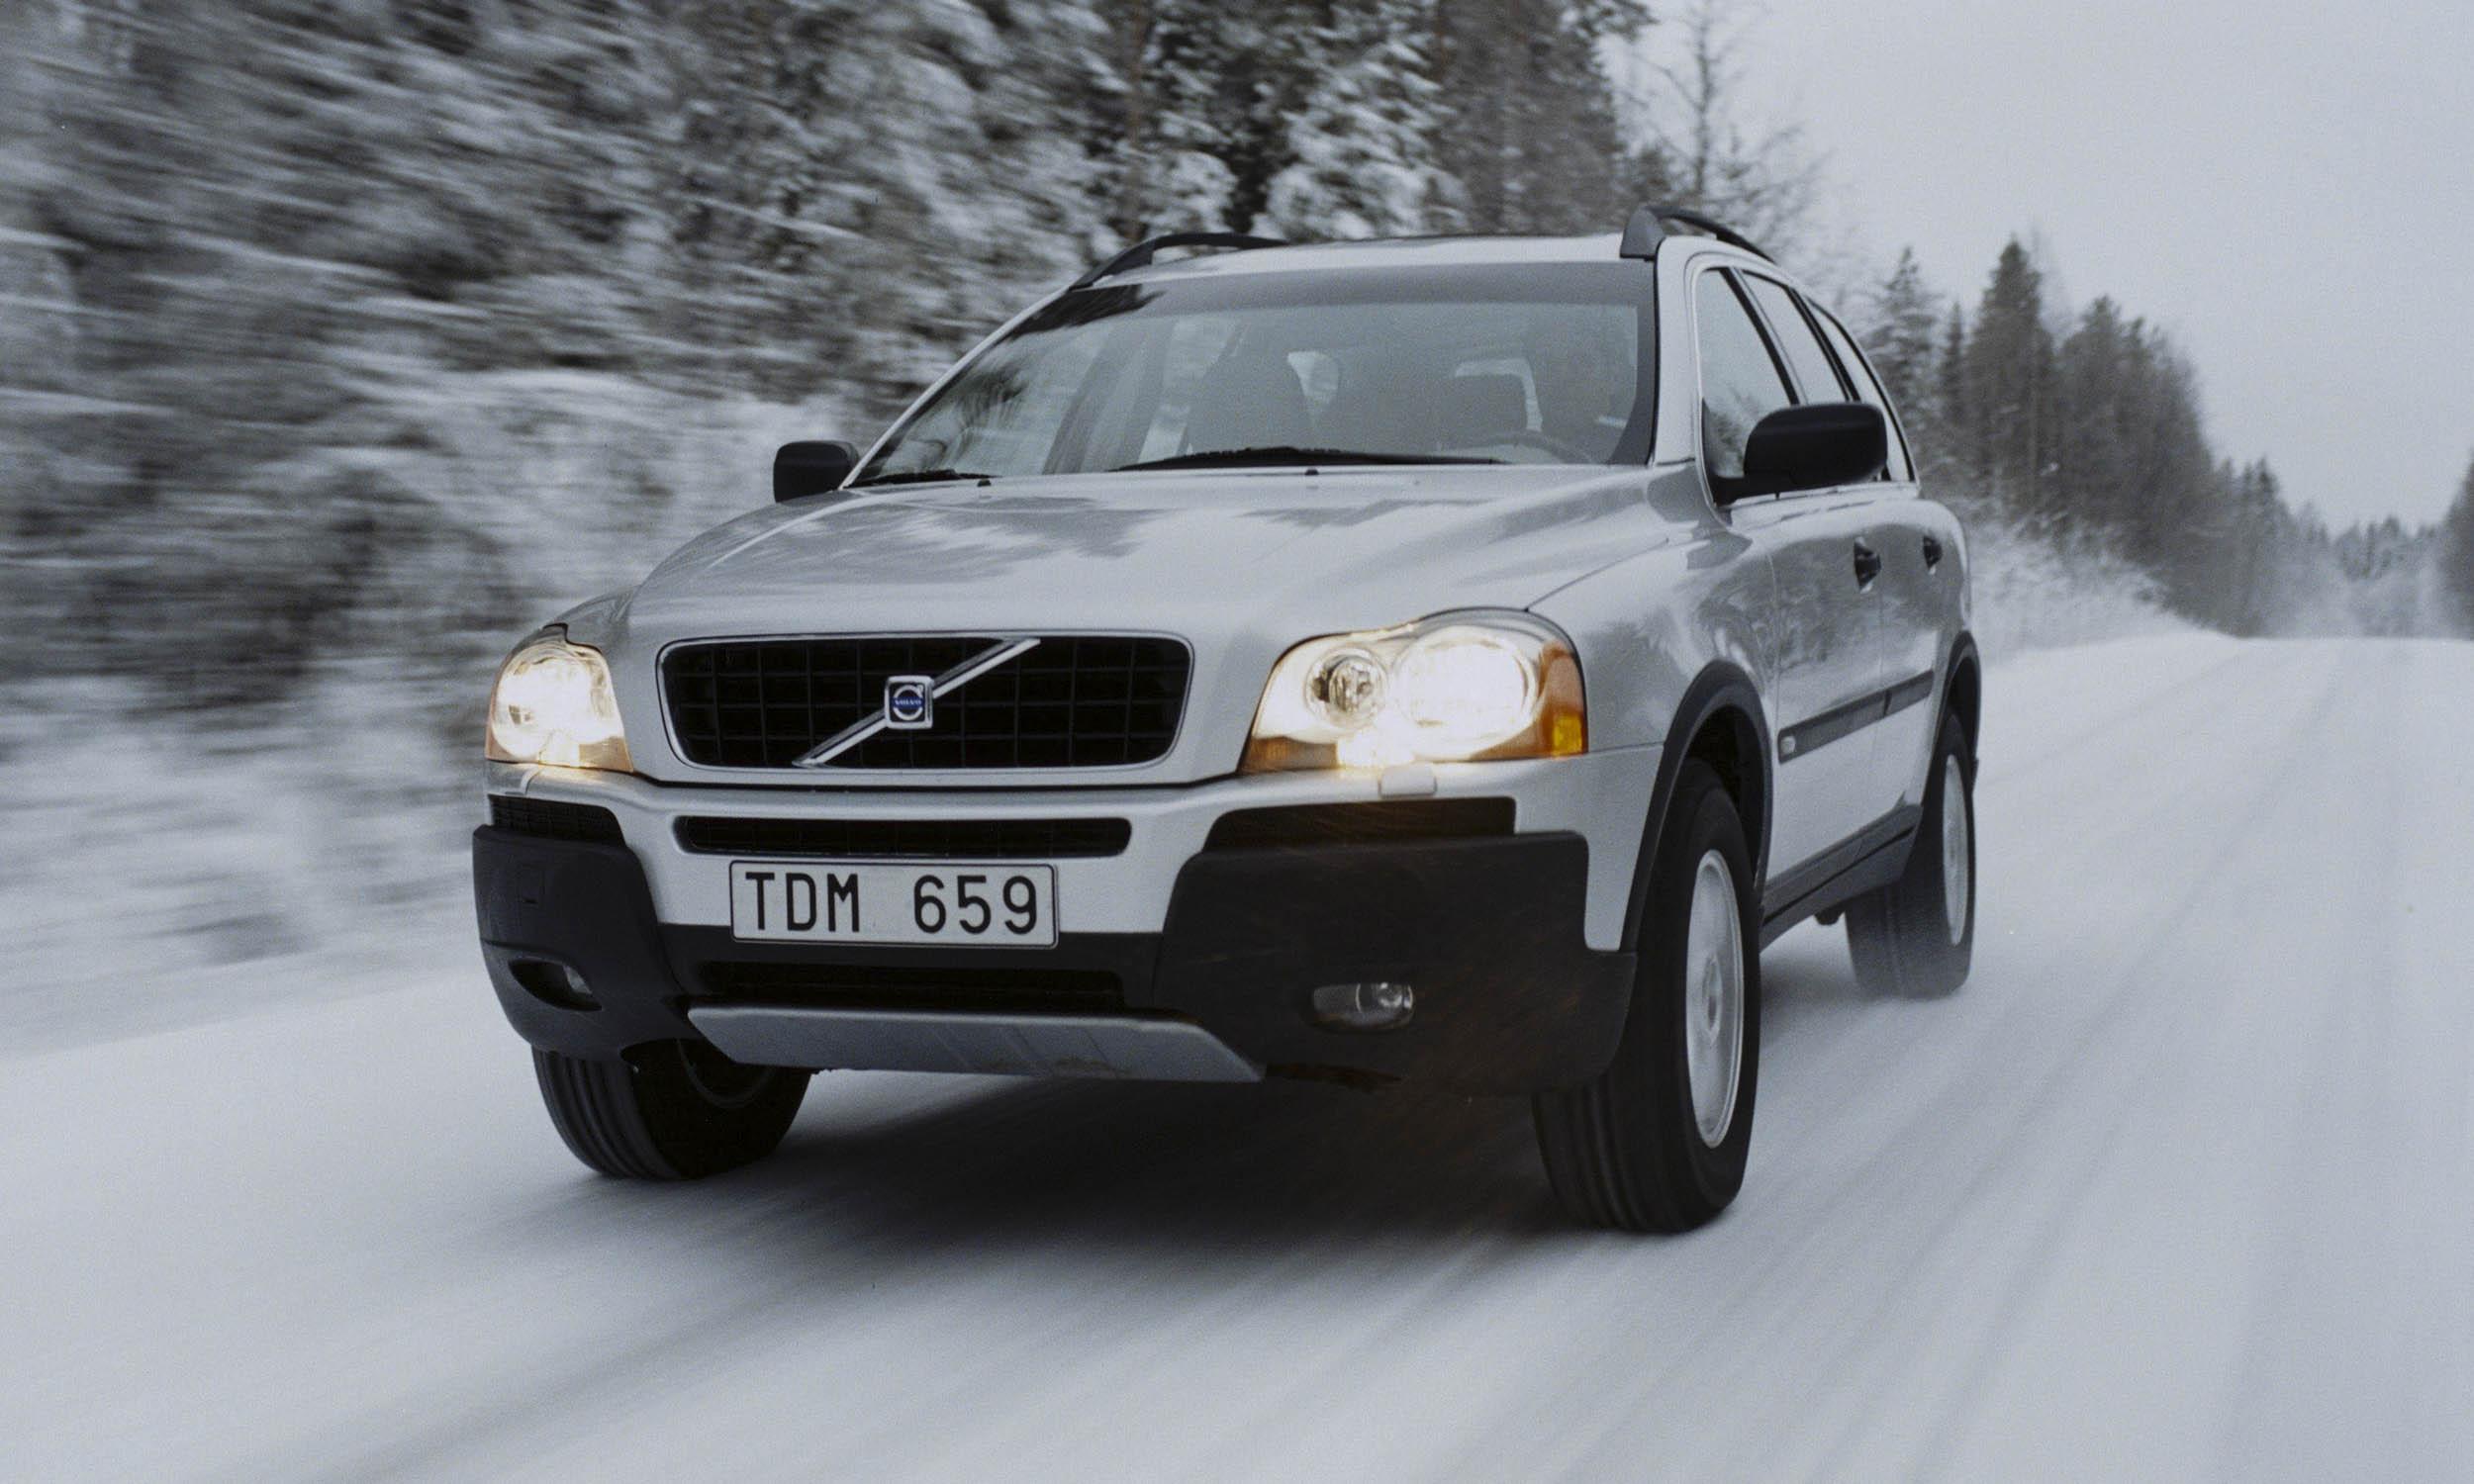 © Volvo Cars North America